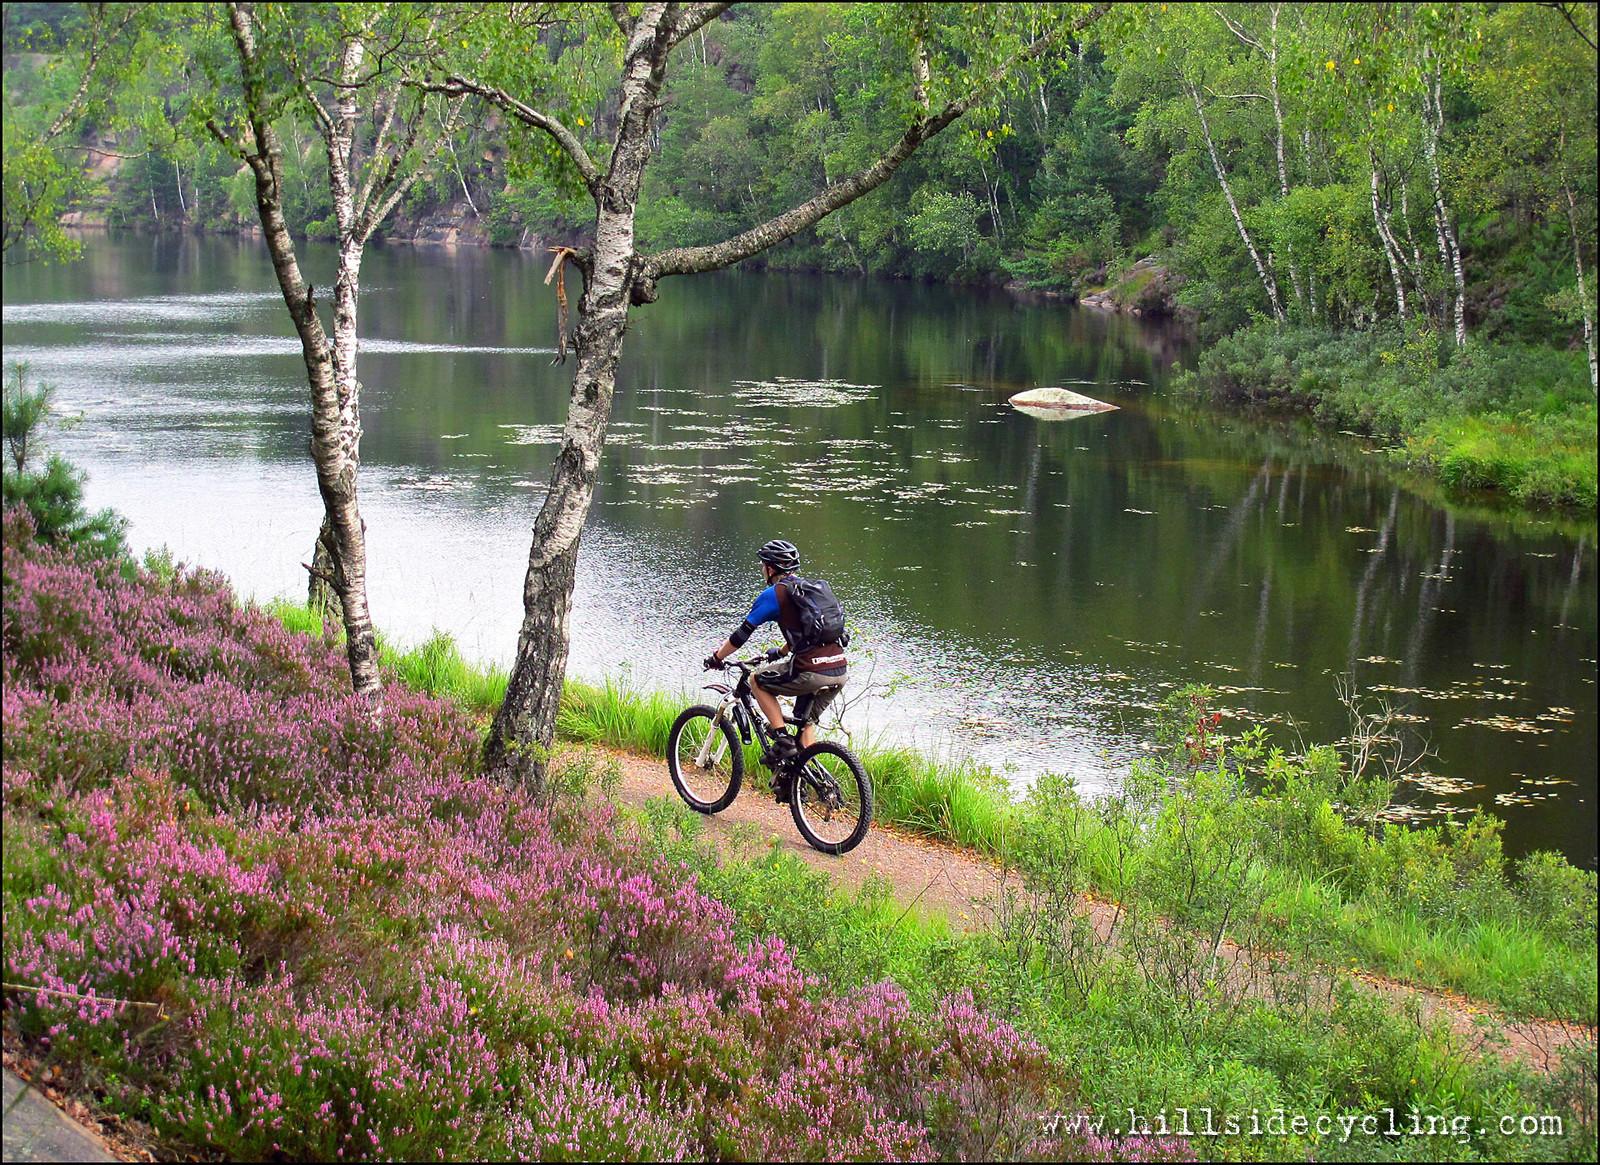 IMG 8960 2LRW - Hillside Cycling - Mountain Biking Pictures - Vital MTB